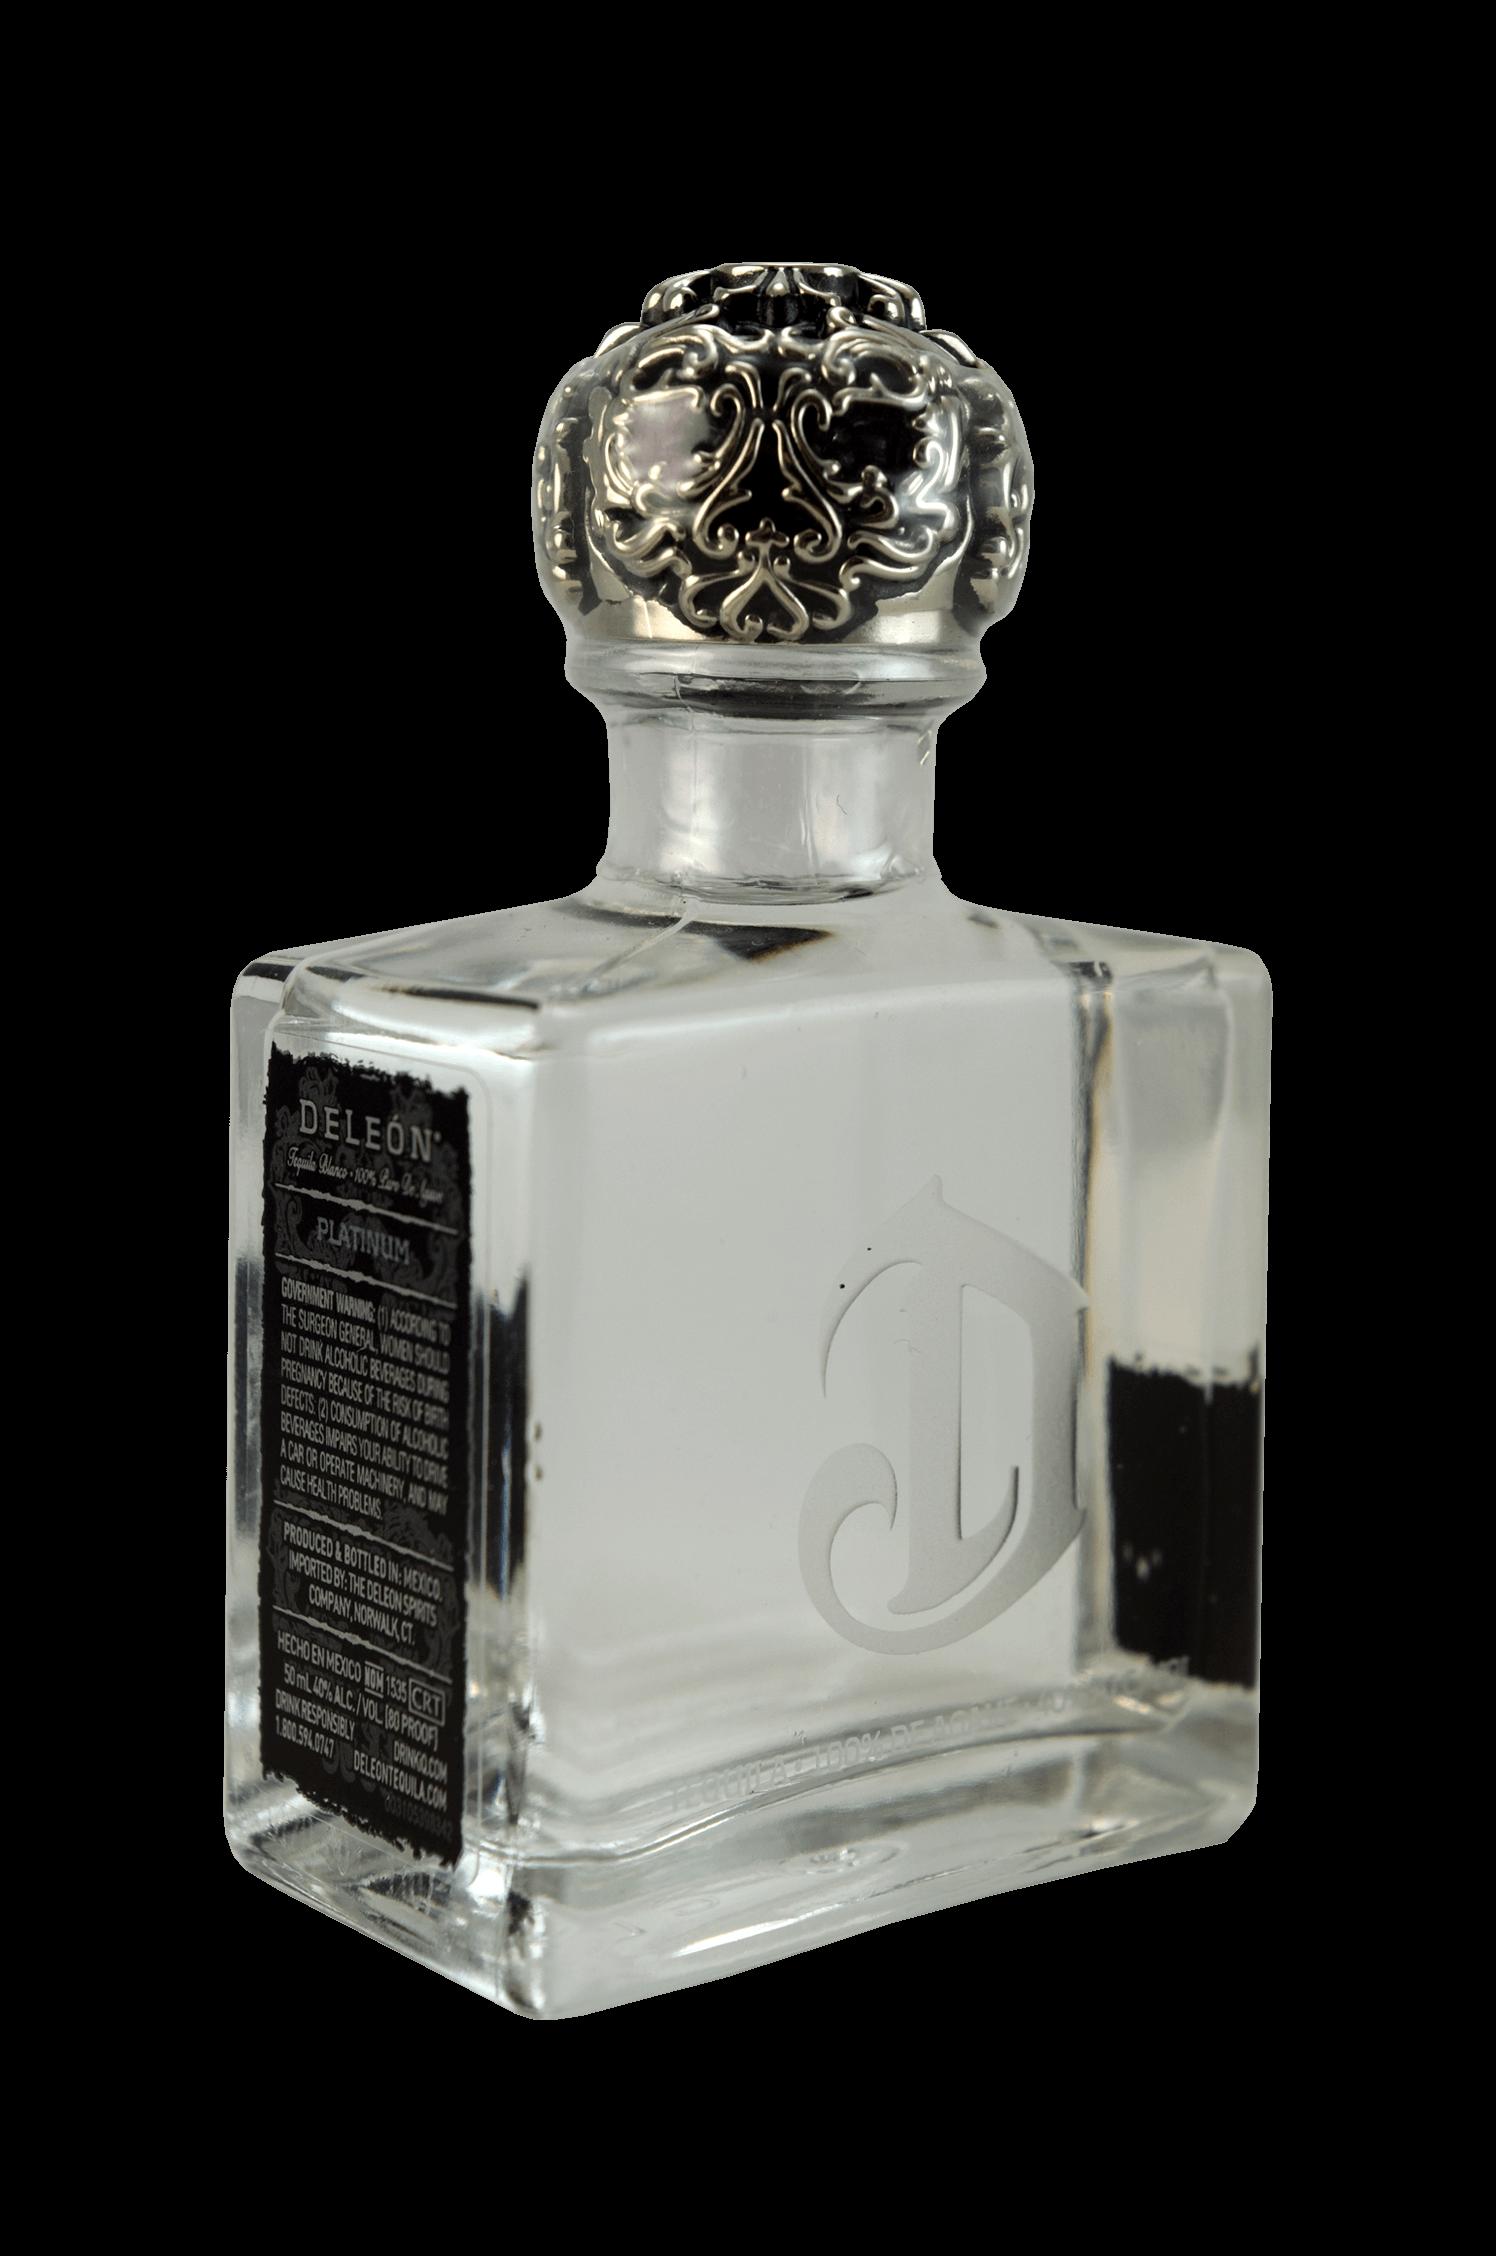 Deleón Platinum Tequila